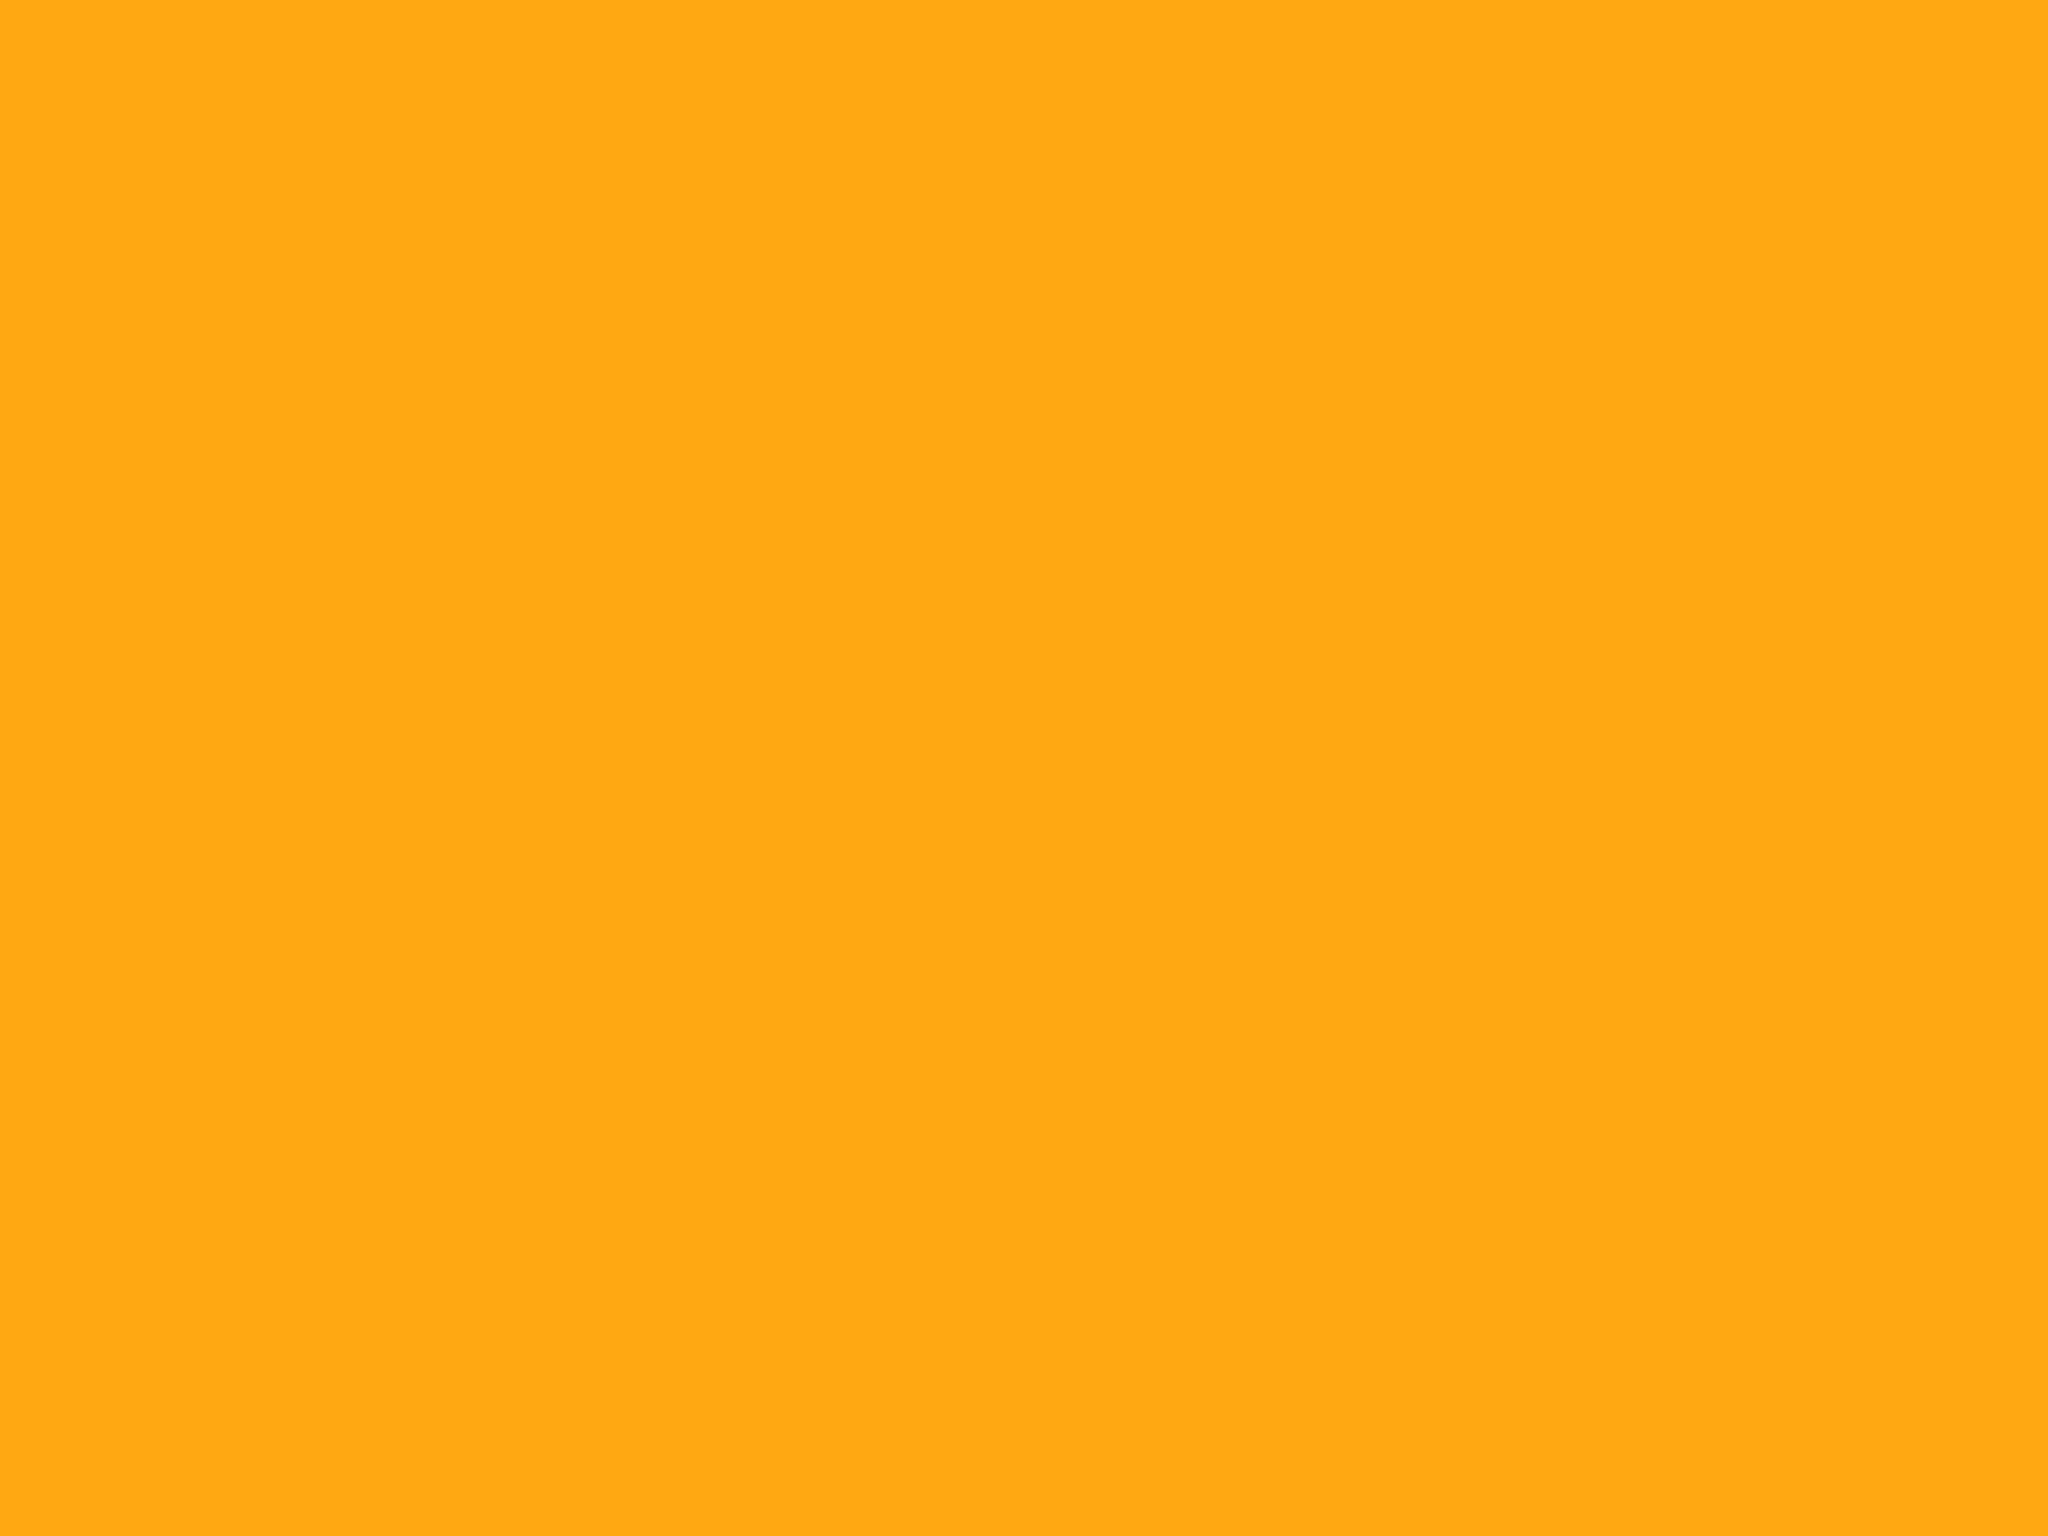 2048x1536 Dark Tangerine Solid Color Background